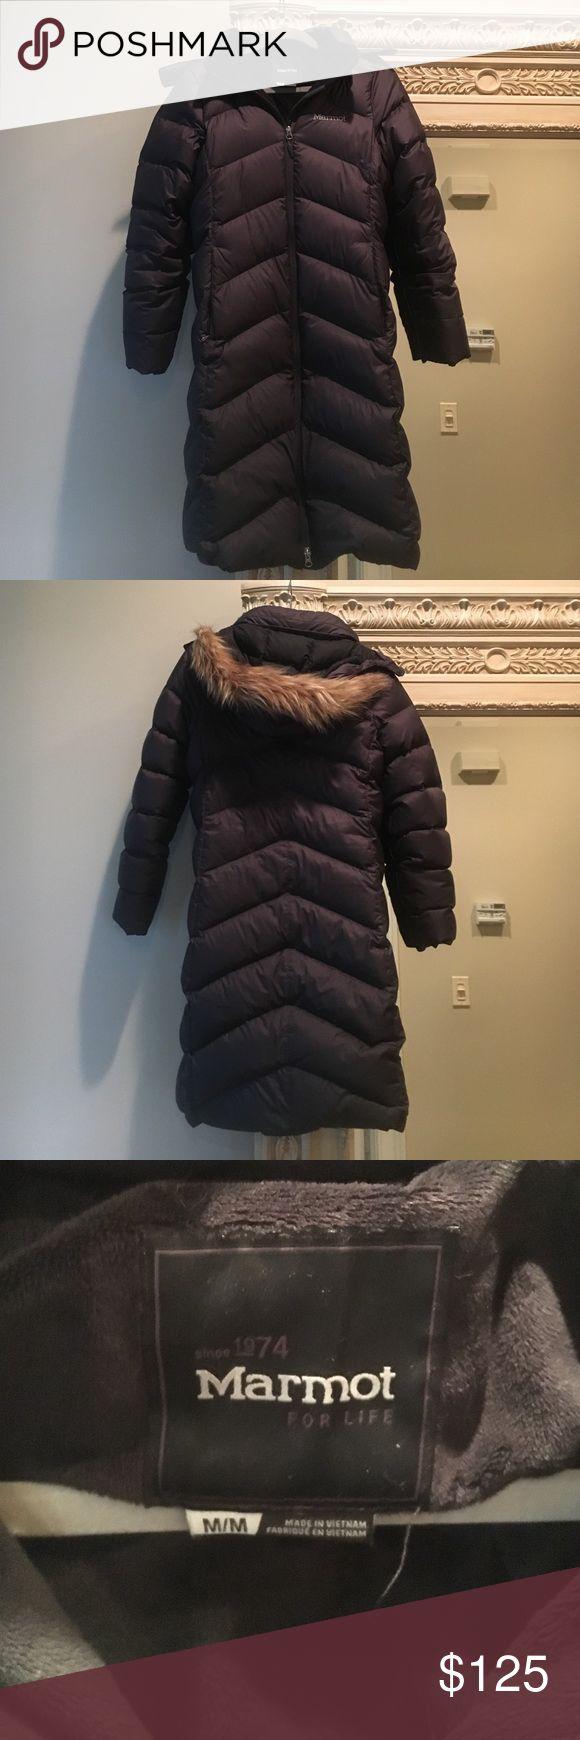 Marmot ladies parka 700 Fill Down coat. Charcoal color. Worn one season. Marmot Jackets & Coats Puffers